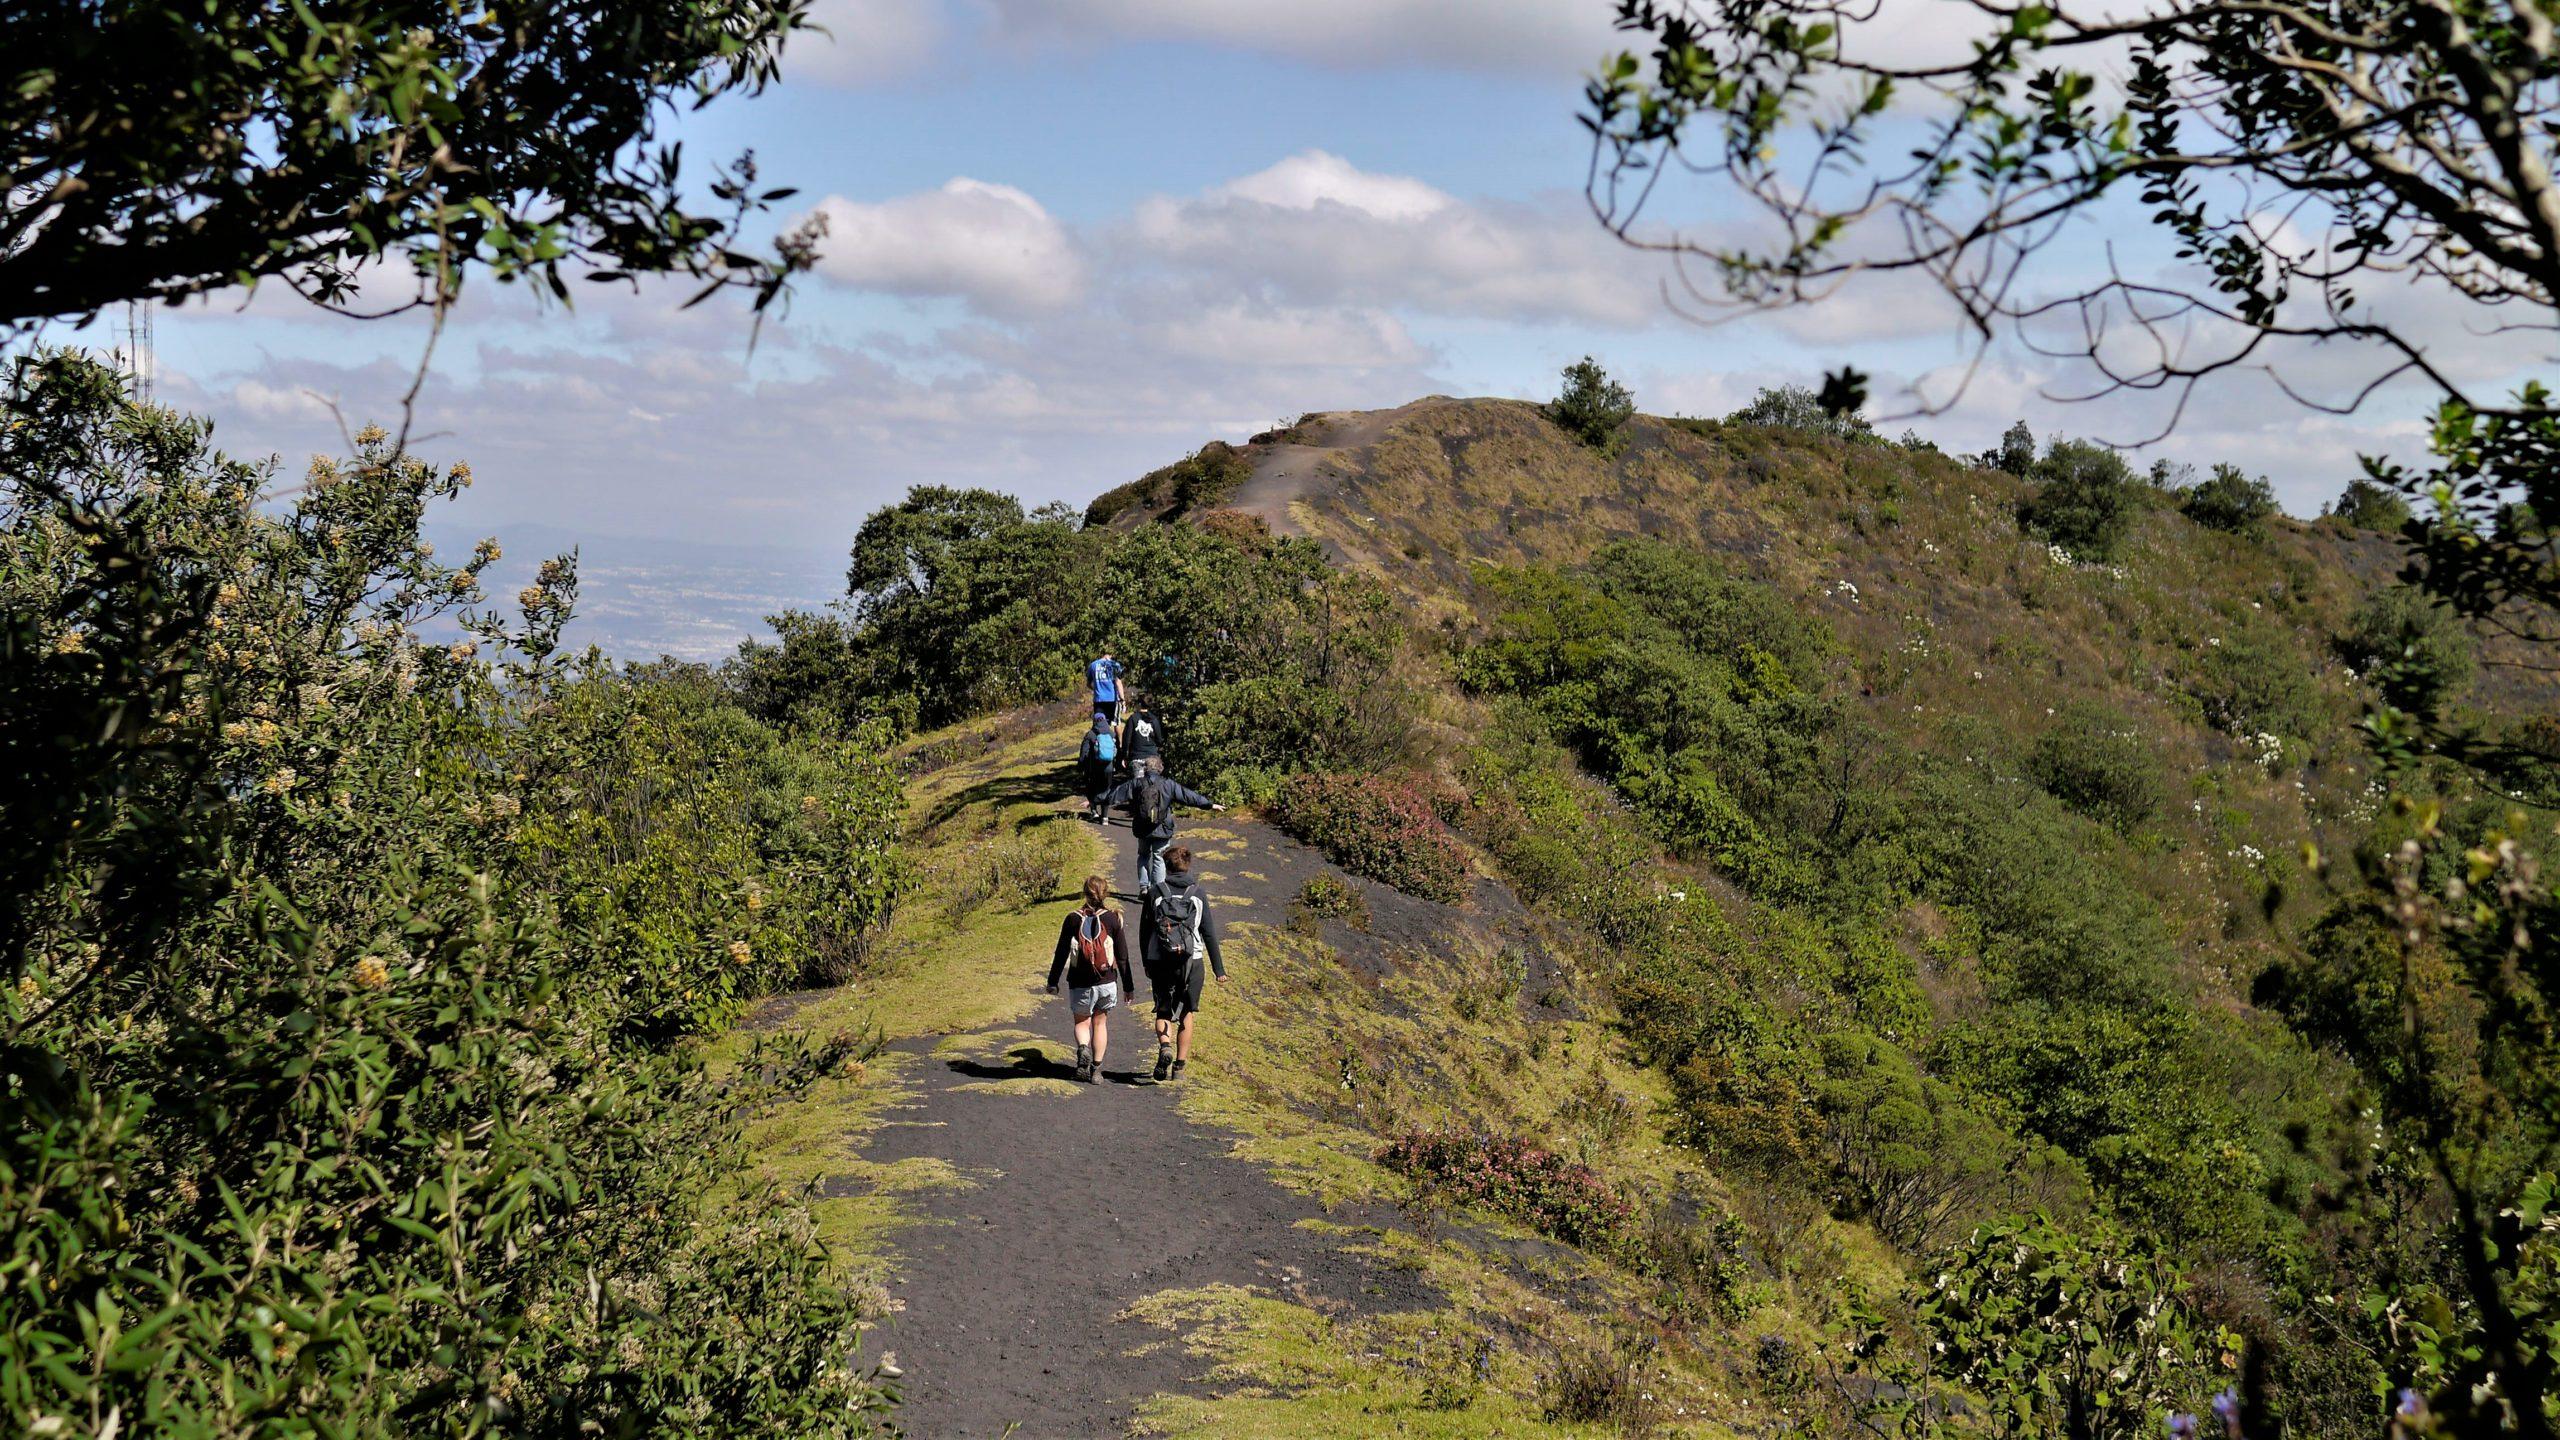 Guatemala voyage au féminin solo risques